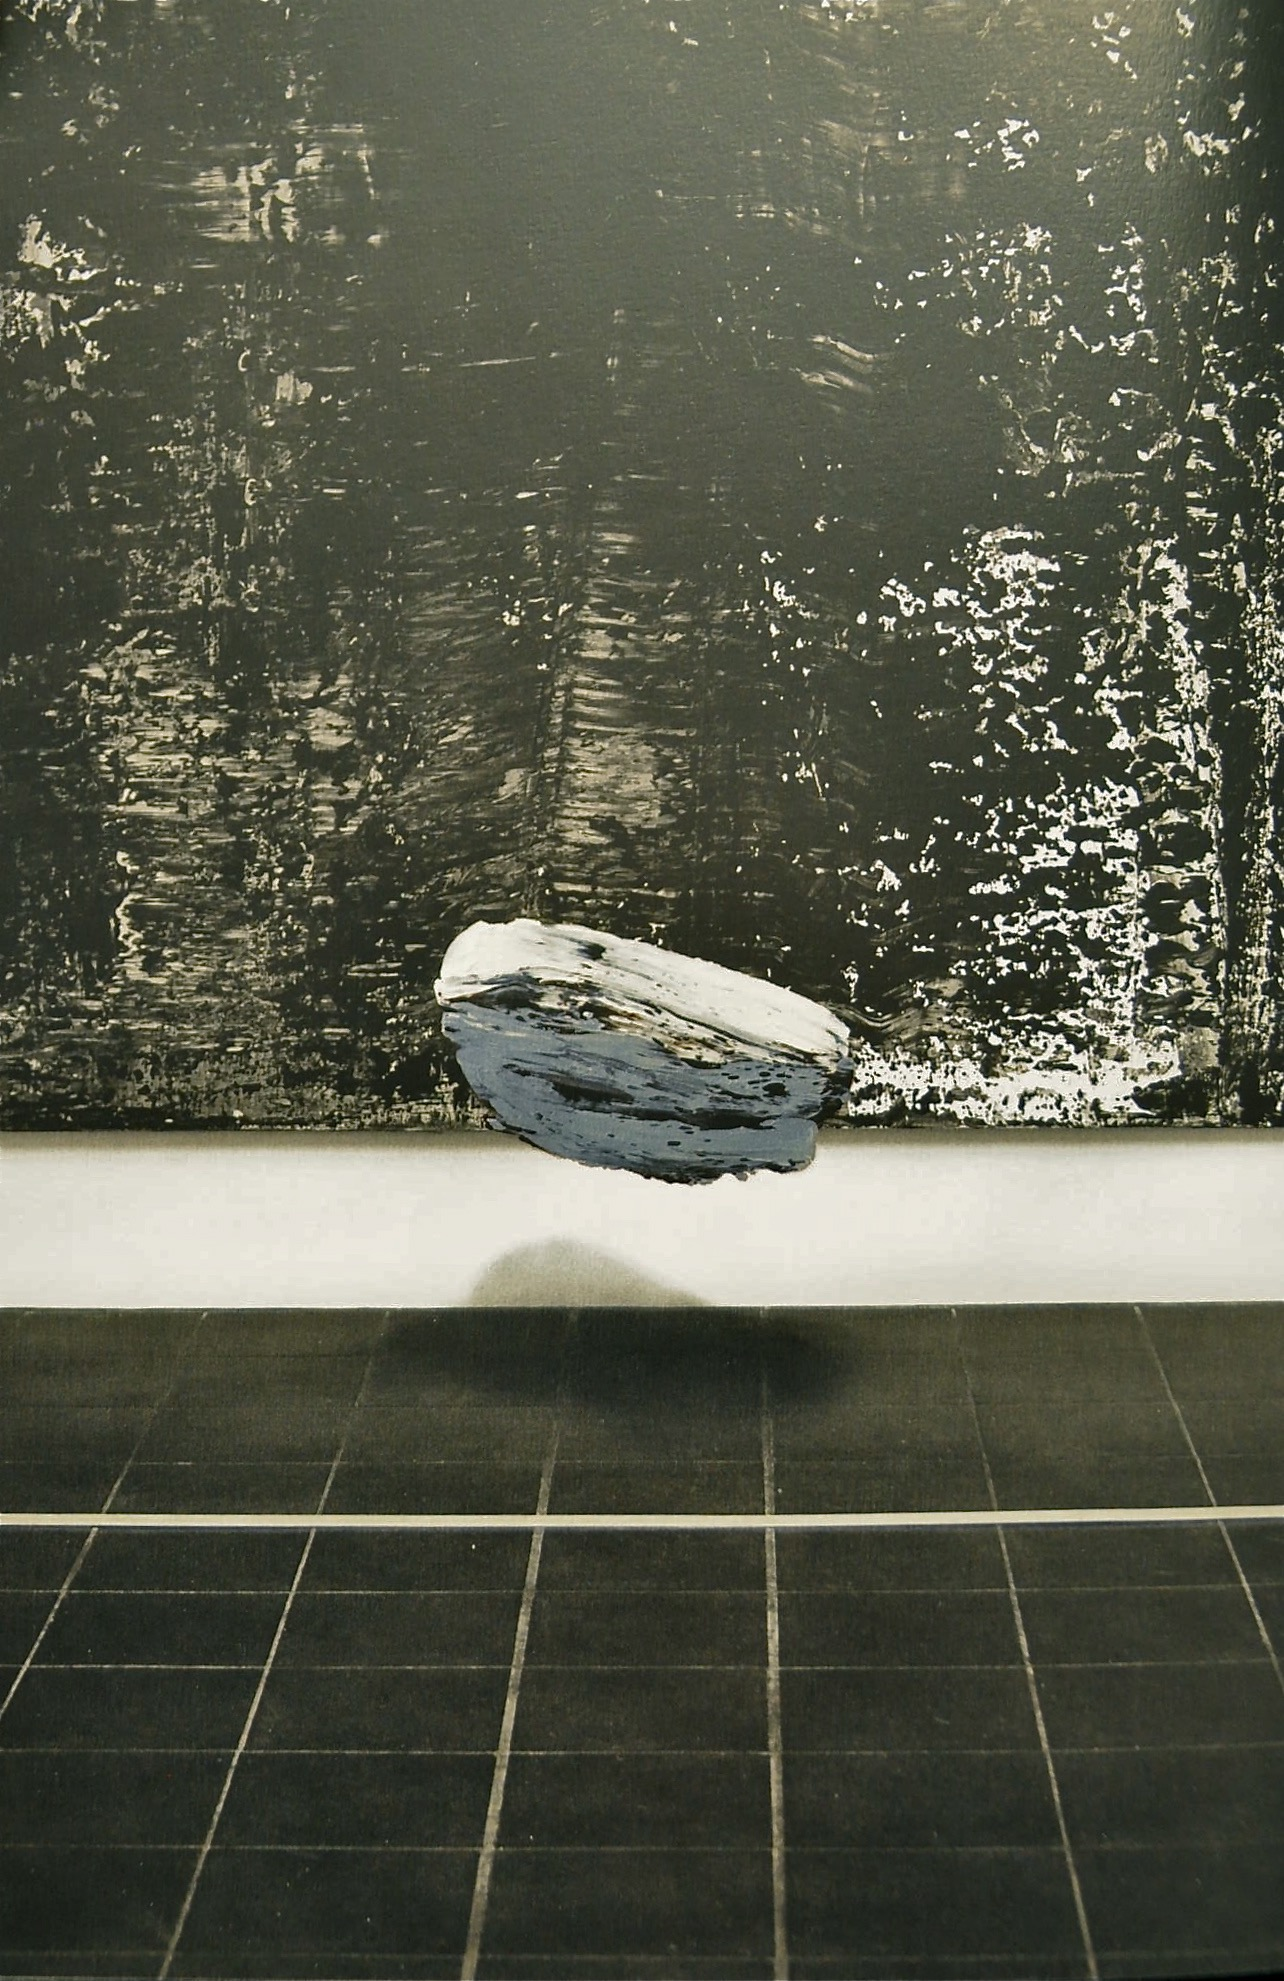 223-5-5 Objekt, Öl auf Silbergelantine-Print, 90x70cm, 2000